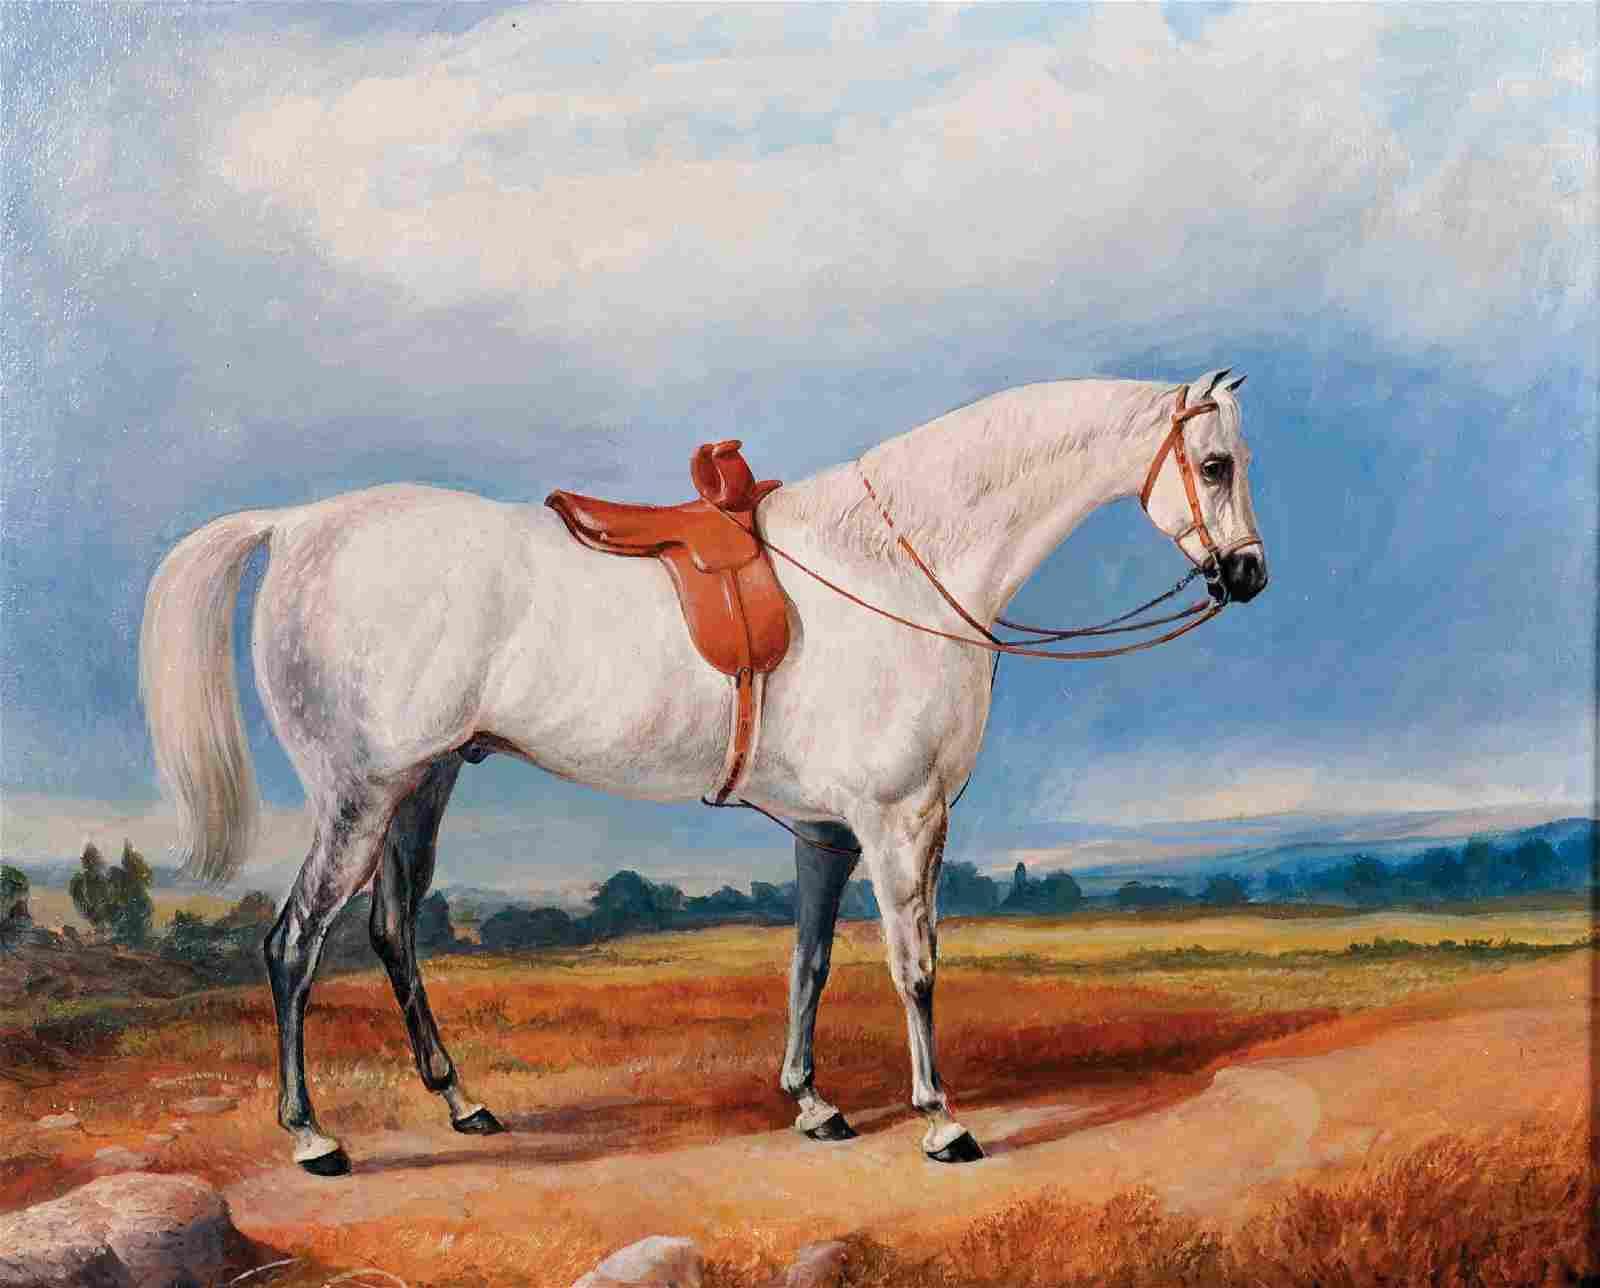 20th Century English School. Study of a Saddled Horse